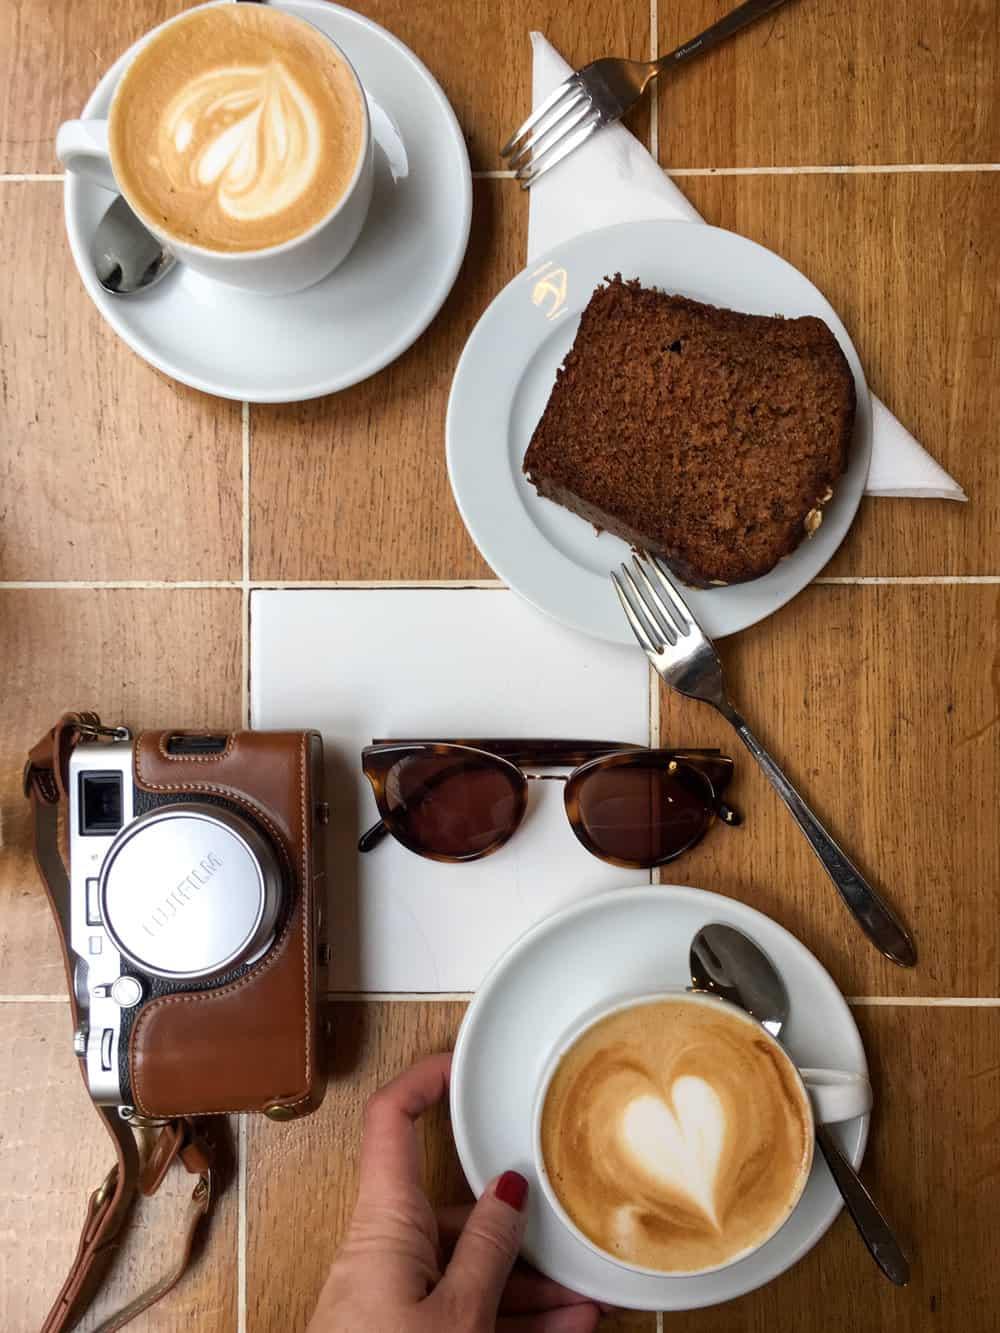 coutume coffee paris france everyday parisian